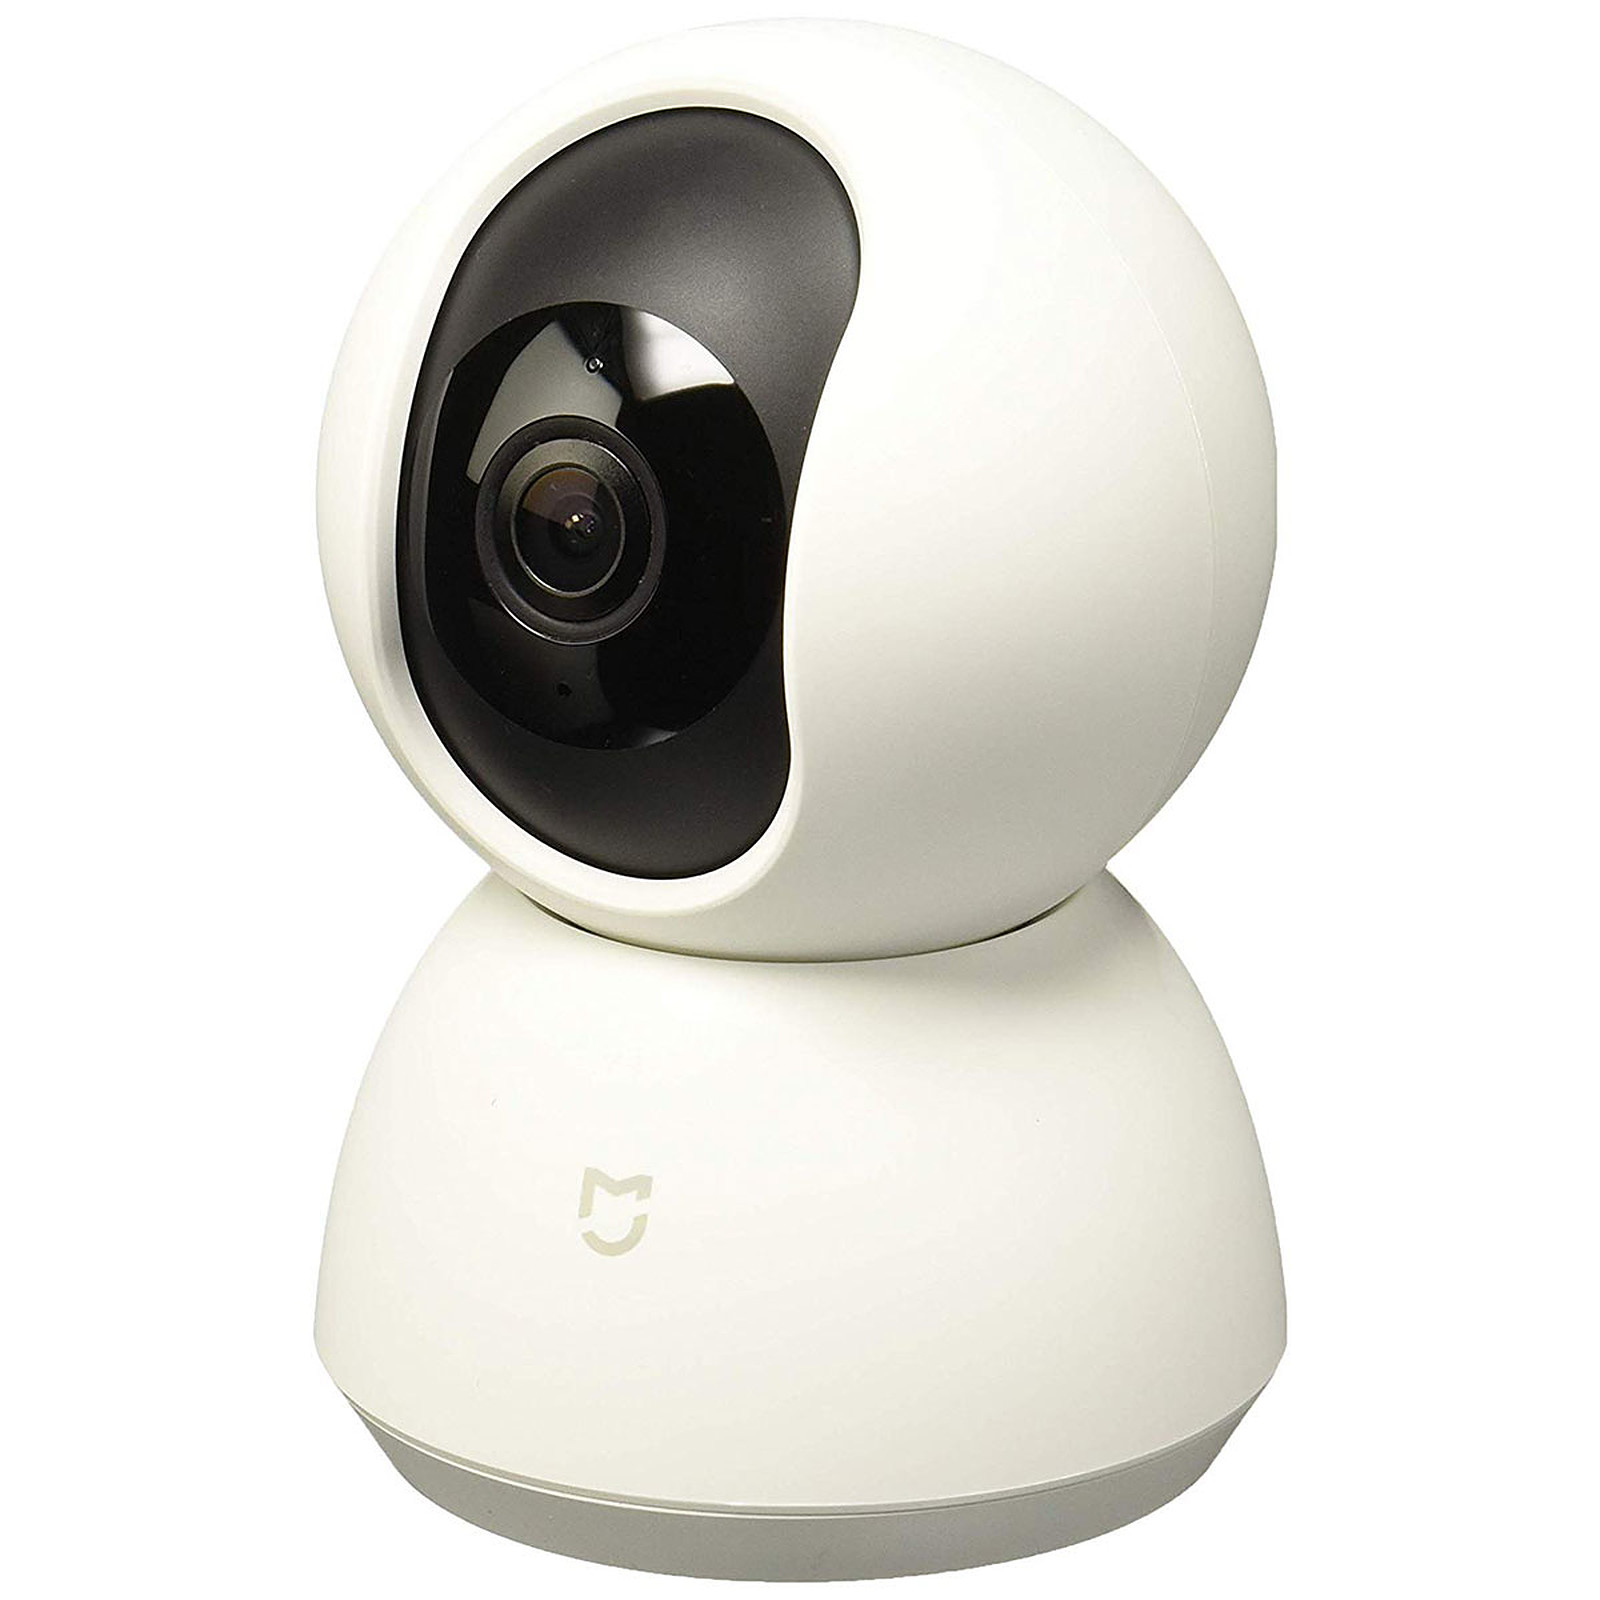 Caméra IP Xiaomi Mi Home Security Camera 360, informatique Reunion 974, Futur Réunion informatique